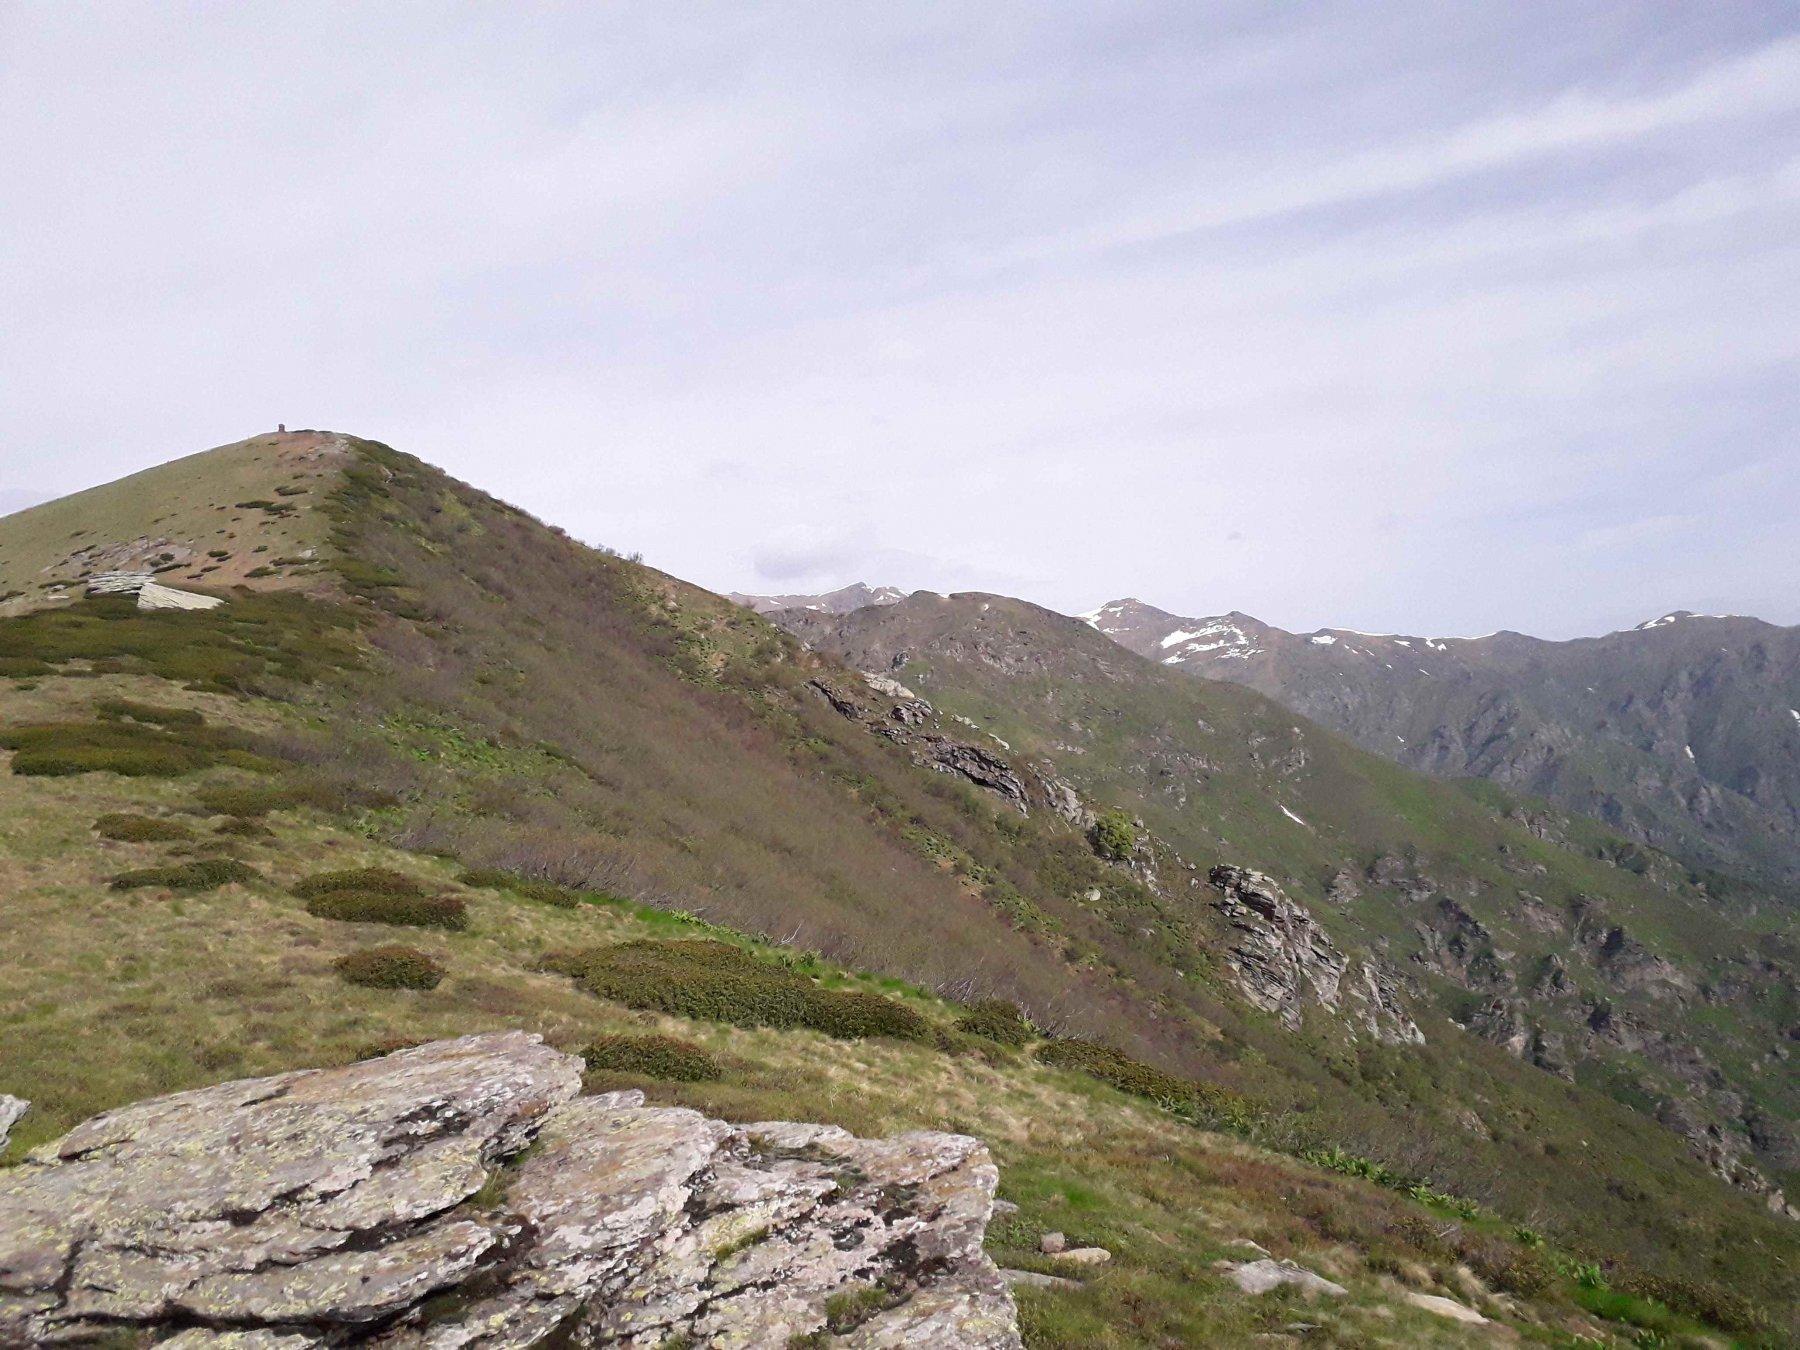 verso la punta del monte vandalino